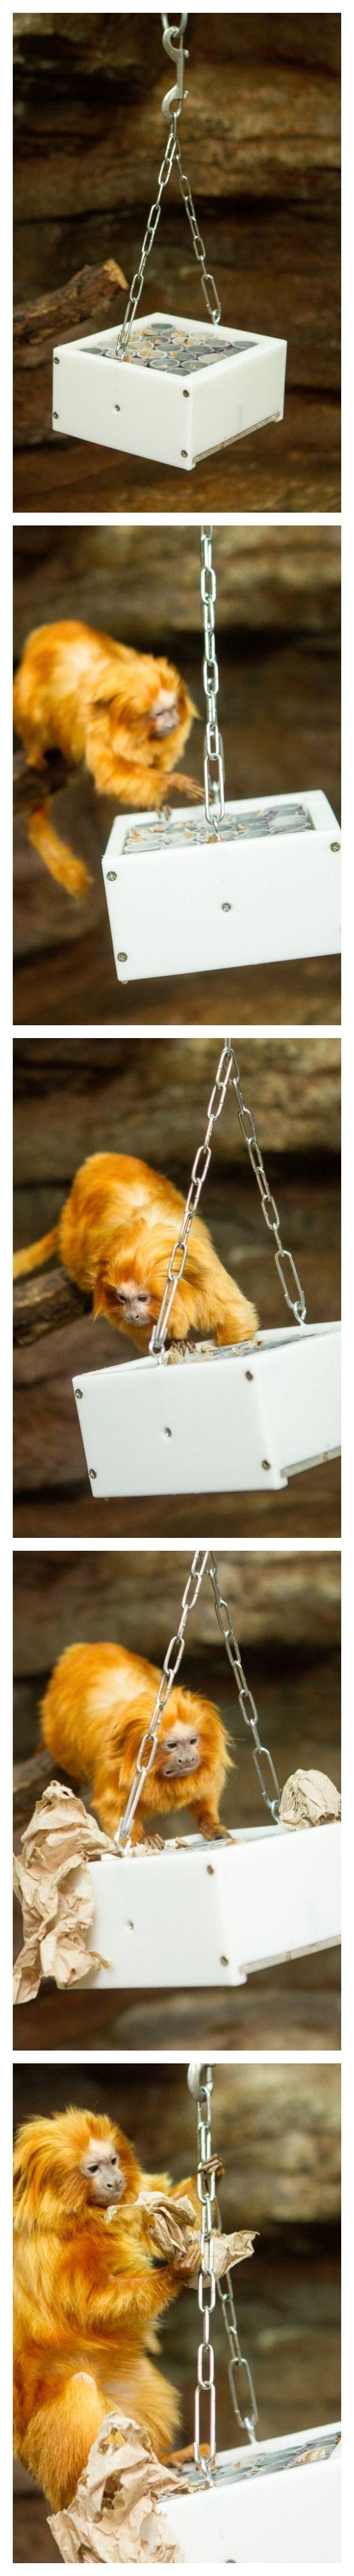 Zoo animal scrapbook ideas - Honeycomb Pvc Feeder For Golden Lion Tamarin At Saint Louis Zoo Zoo Enrichment Ideasanimal